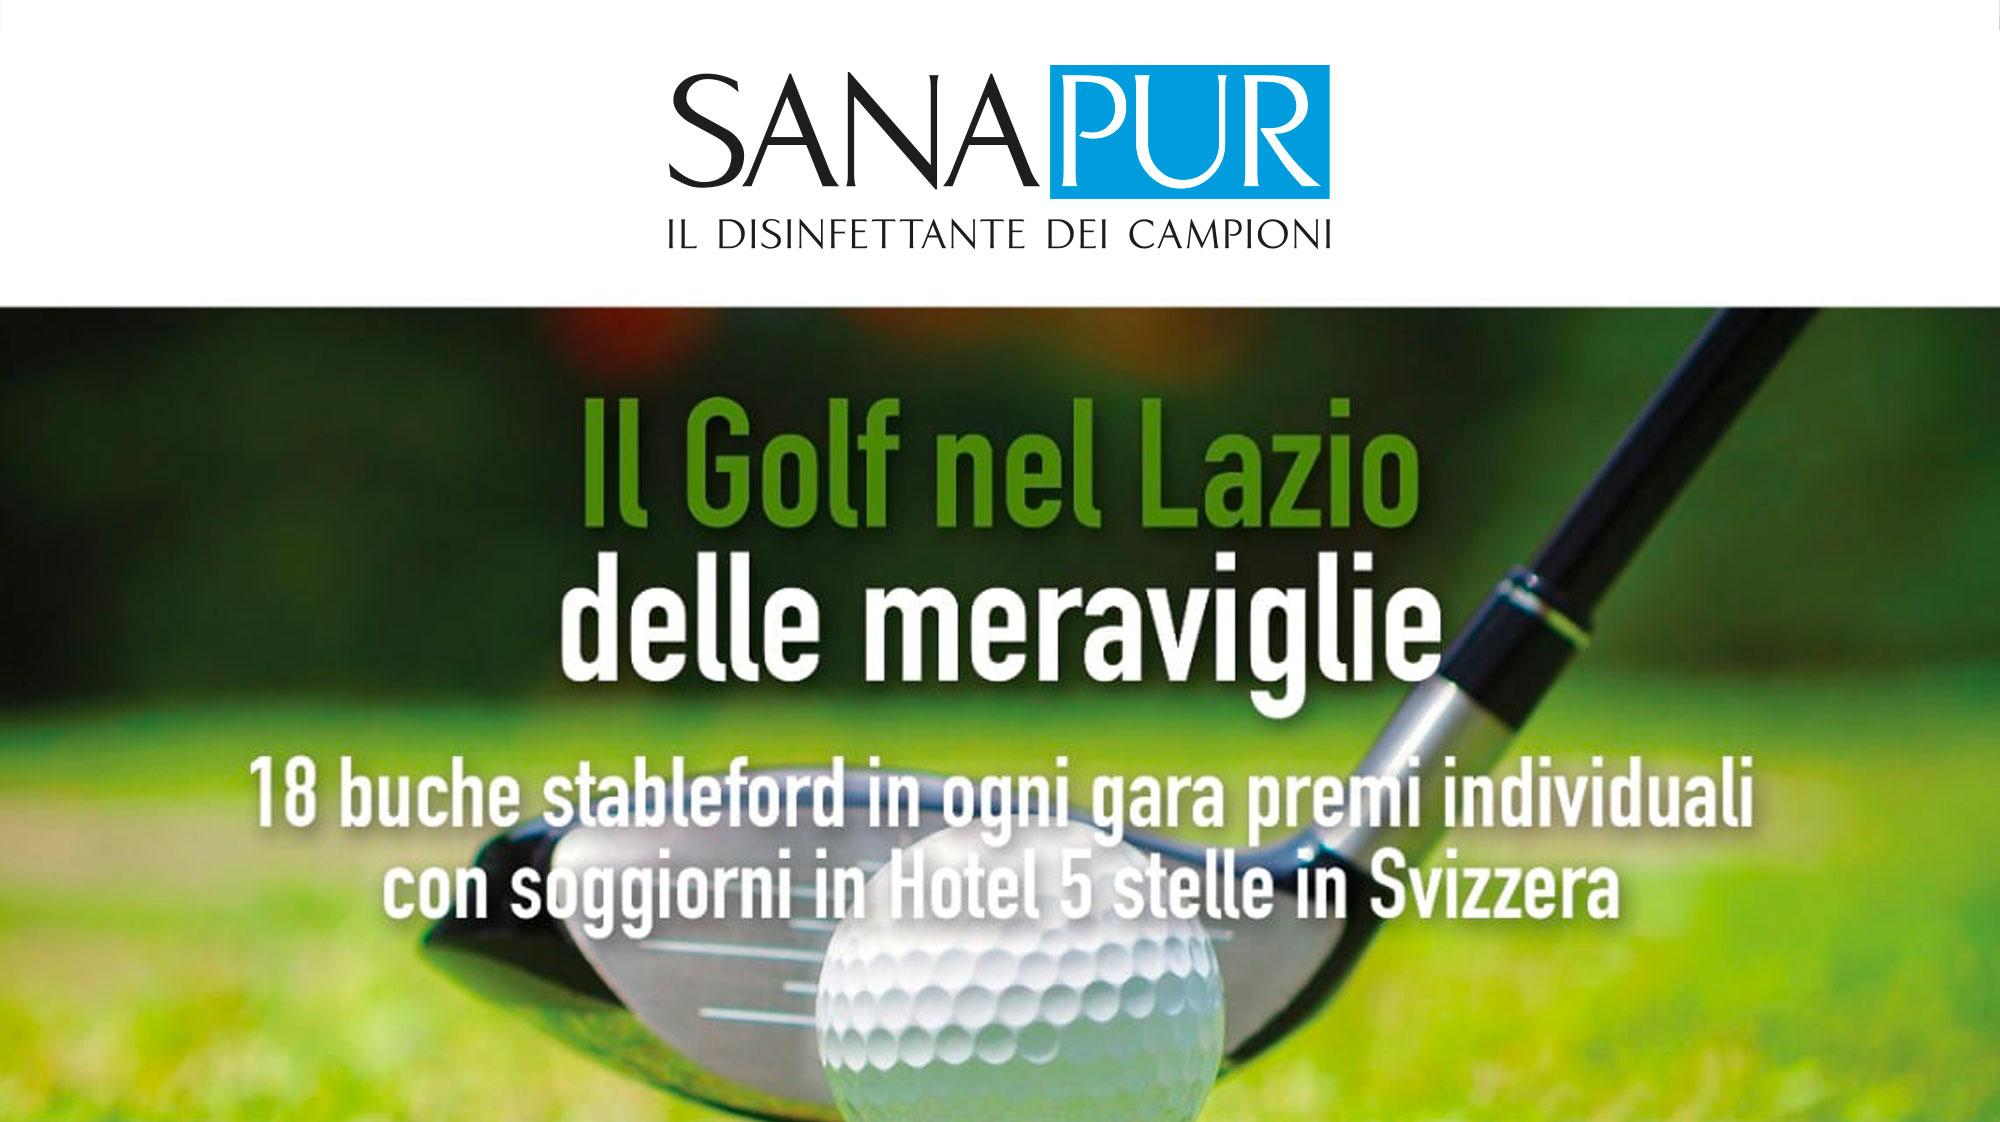 sanapur-sponsor-lazio-meraviglie-golf-copertina-meglioinsalute